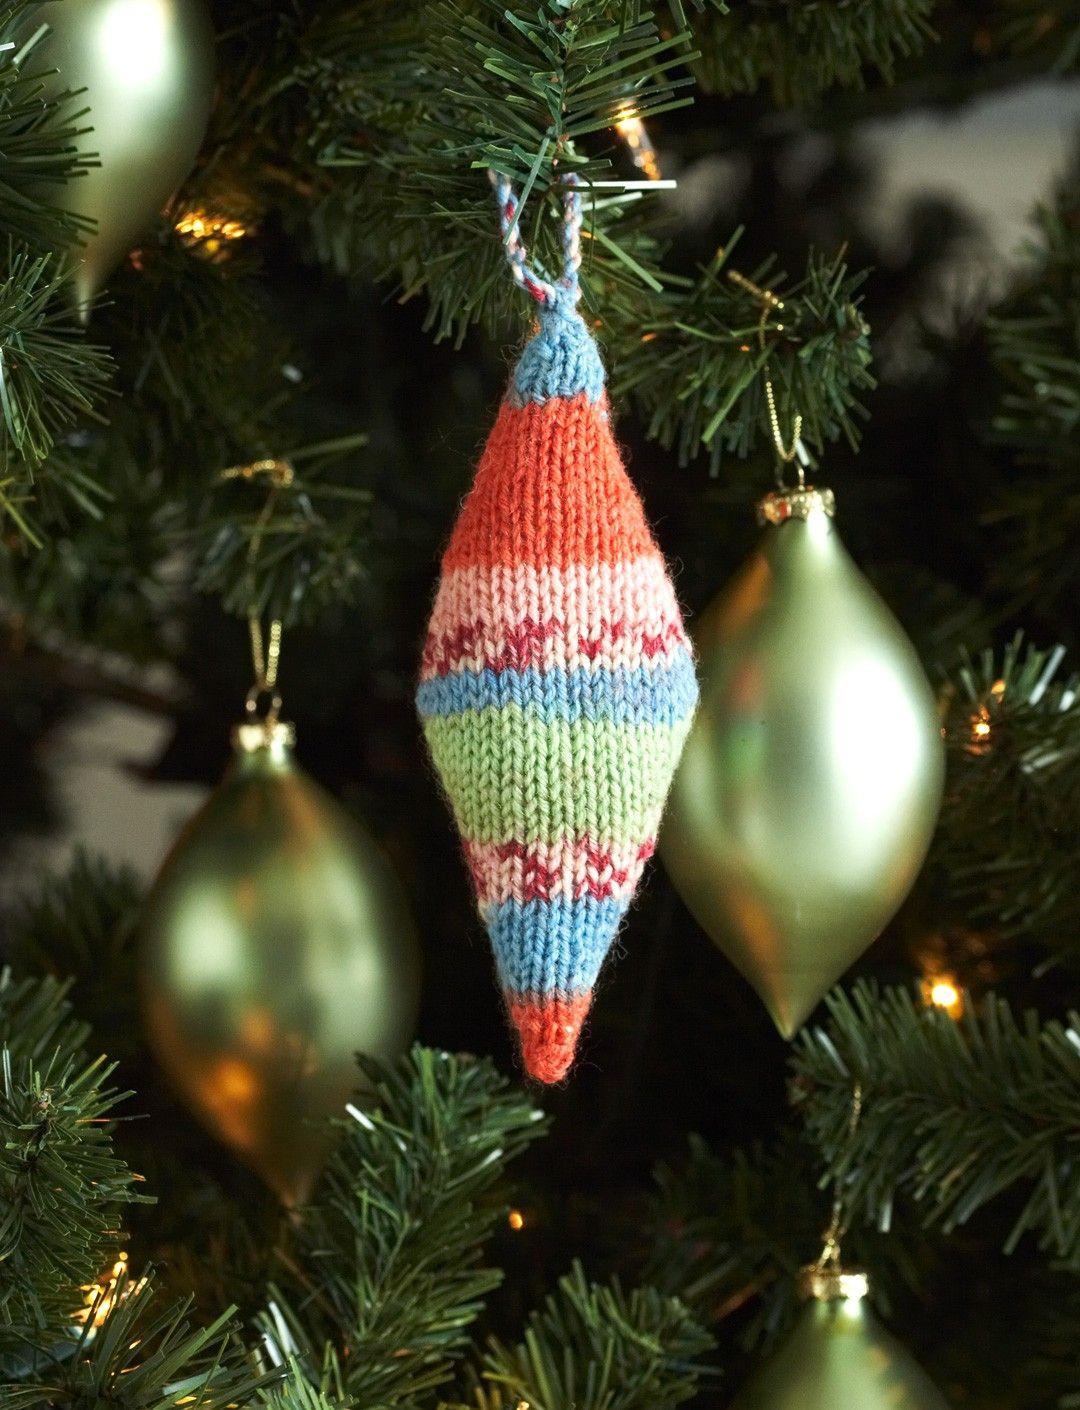 Yarnspirations.com - Patons Knit Christmas Ornaments - Patterns ...